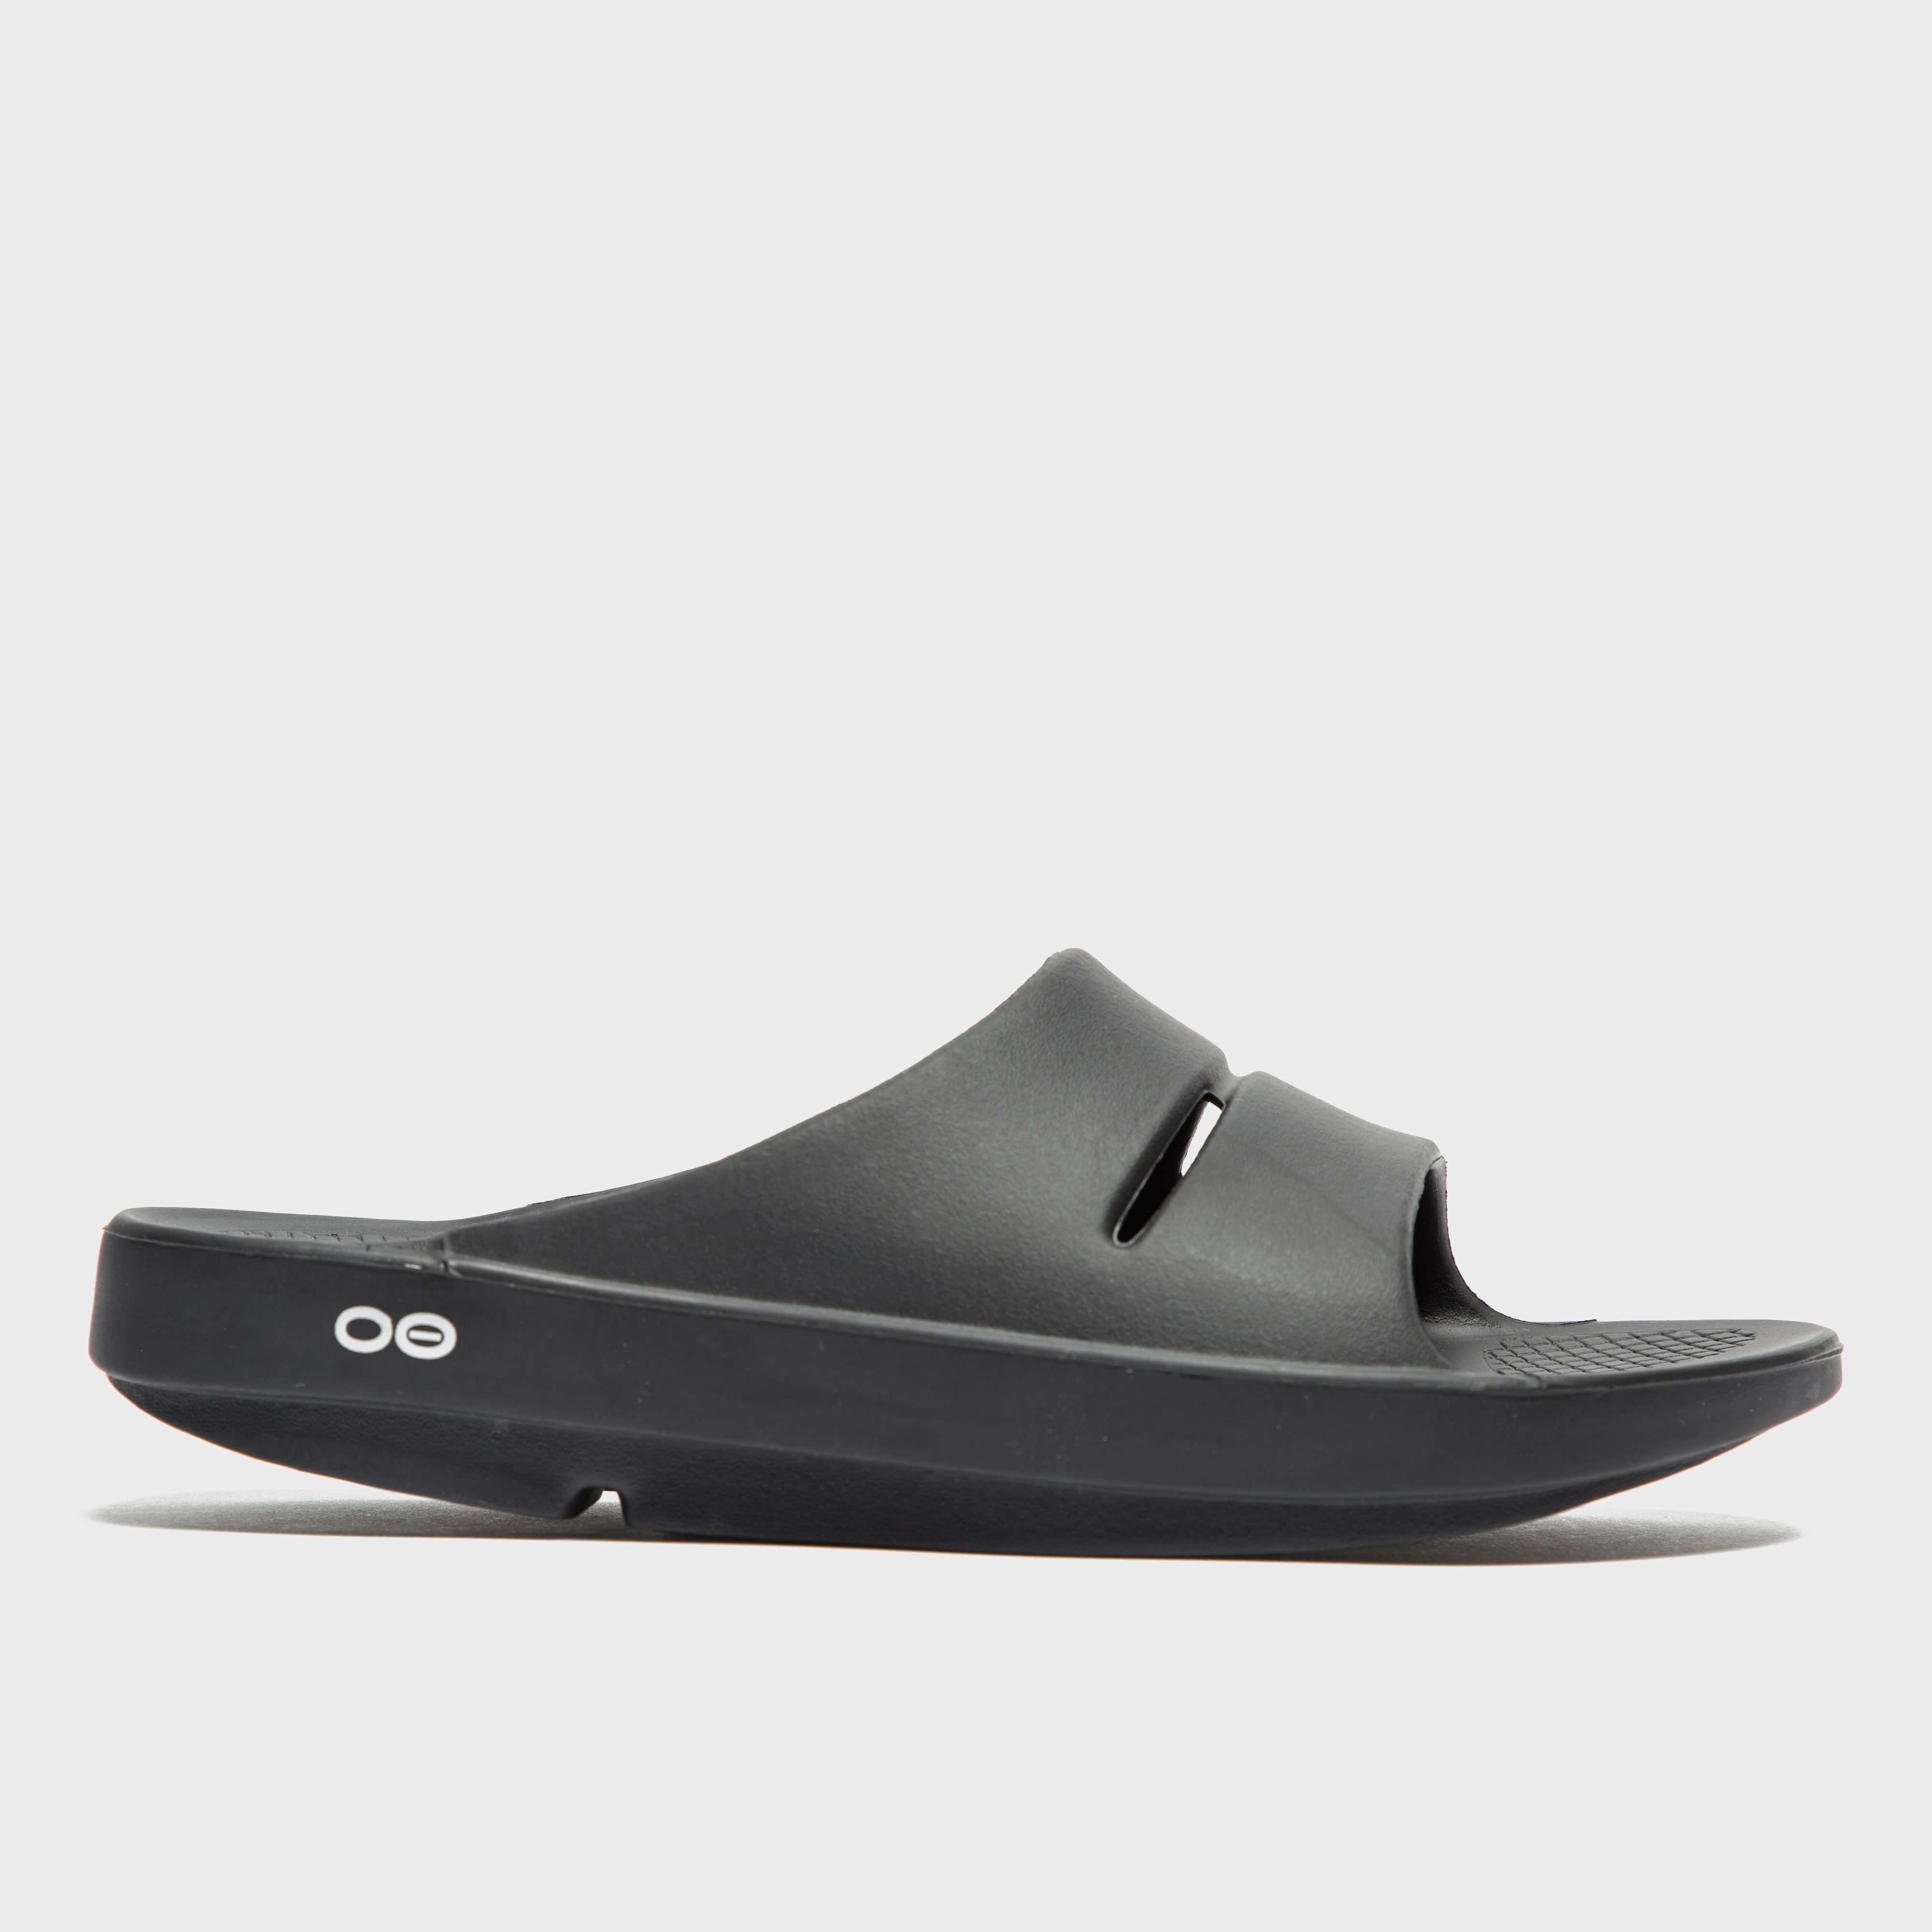 OOFOS Women's OOahh Slides